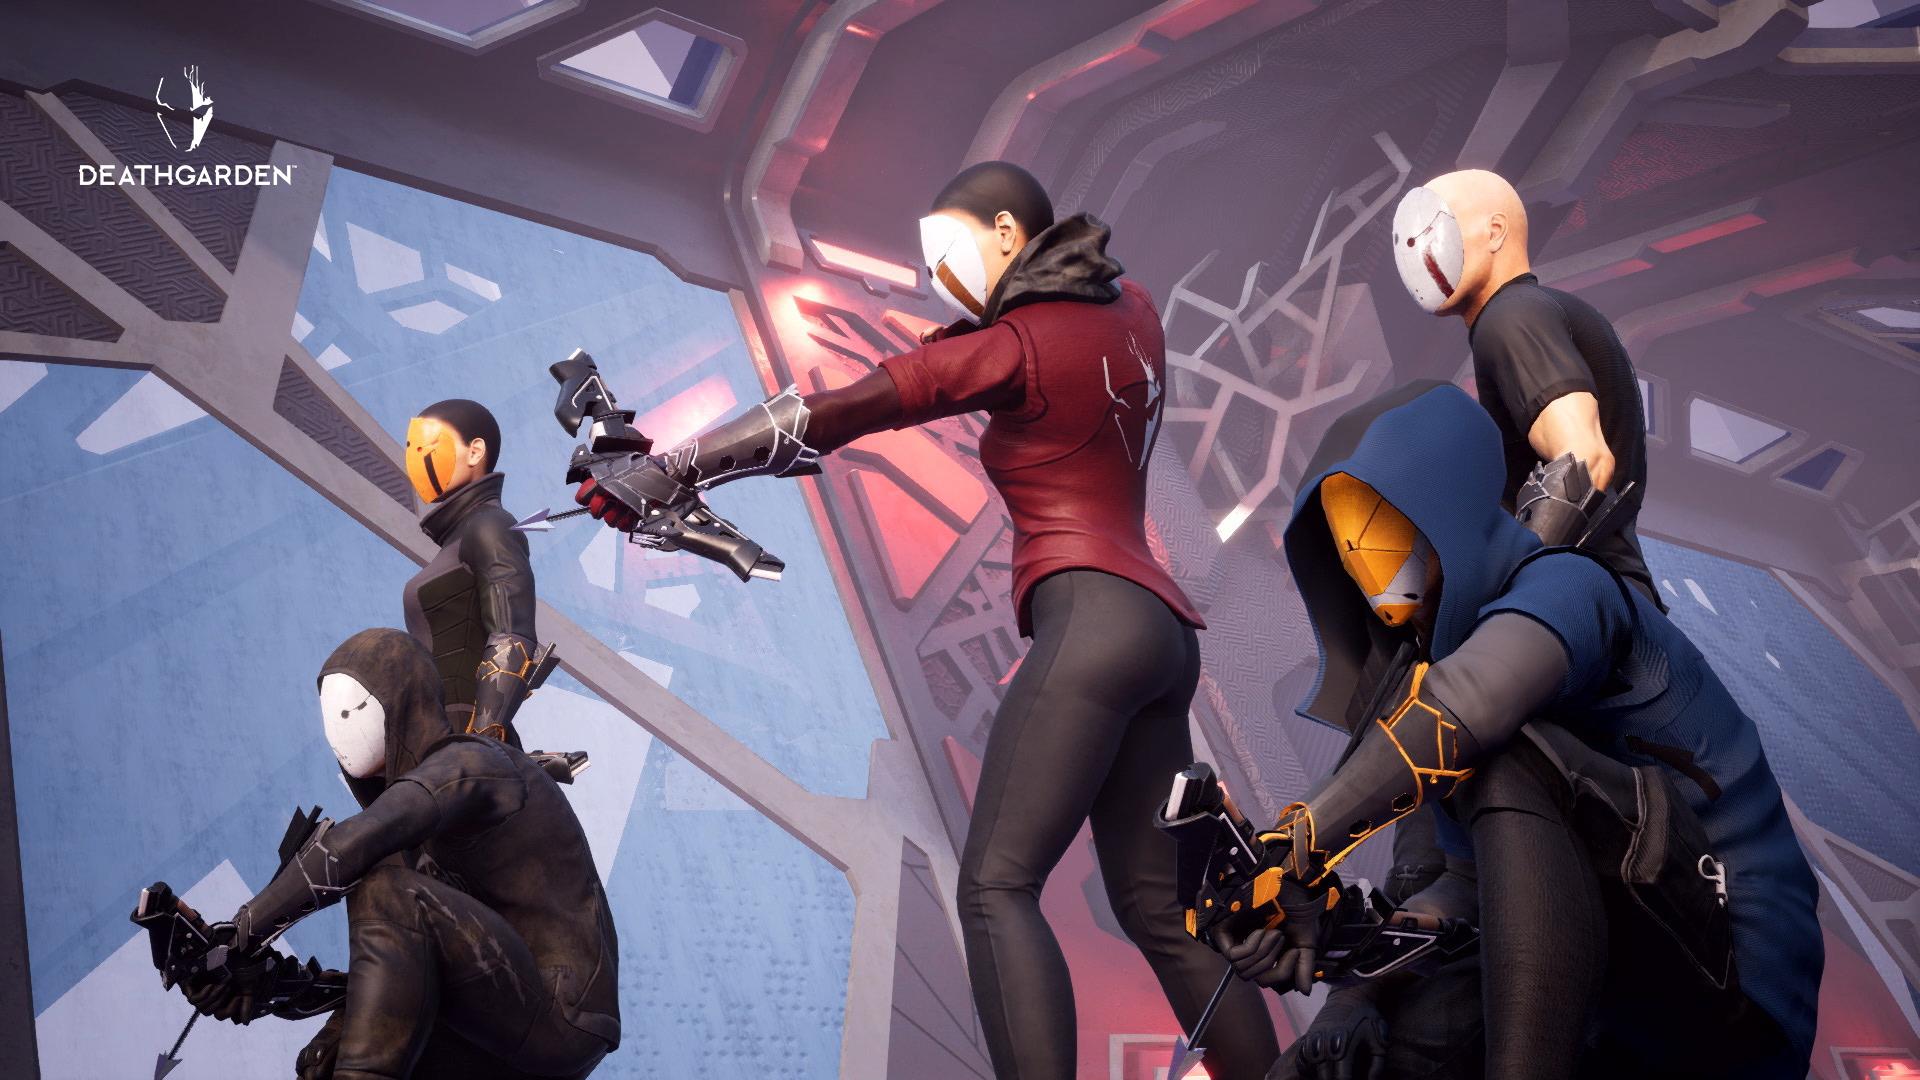 Was ist Deathgarden? Neues 5vs1-Actionspiel verspricht Adrenalin-Kick